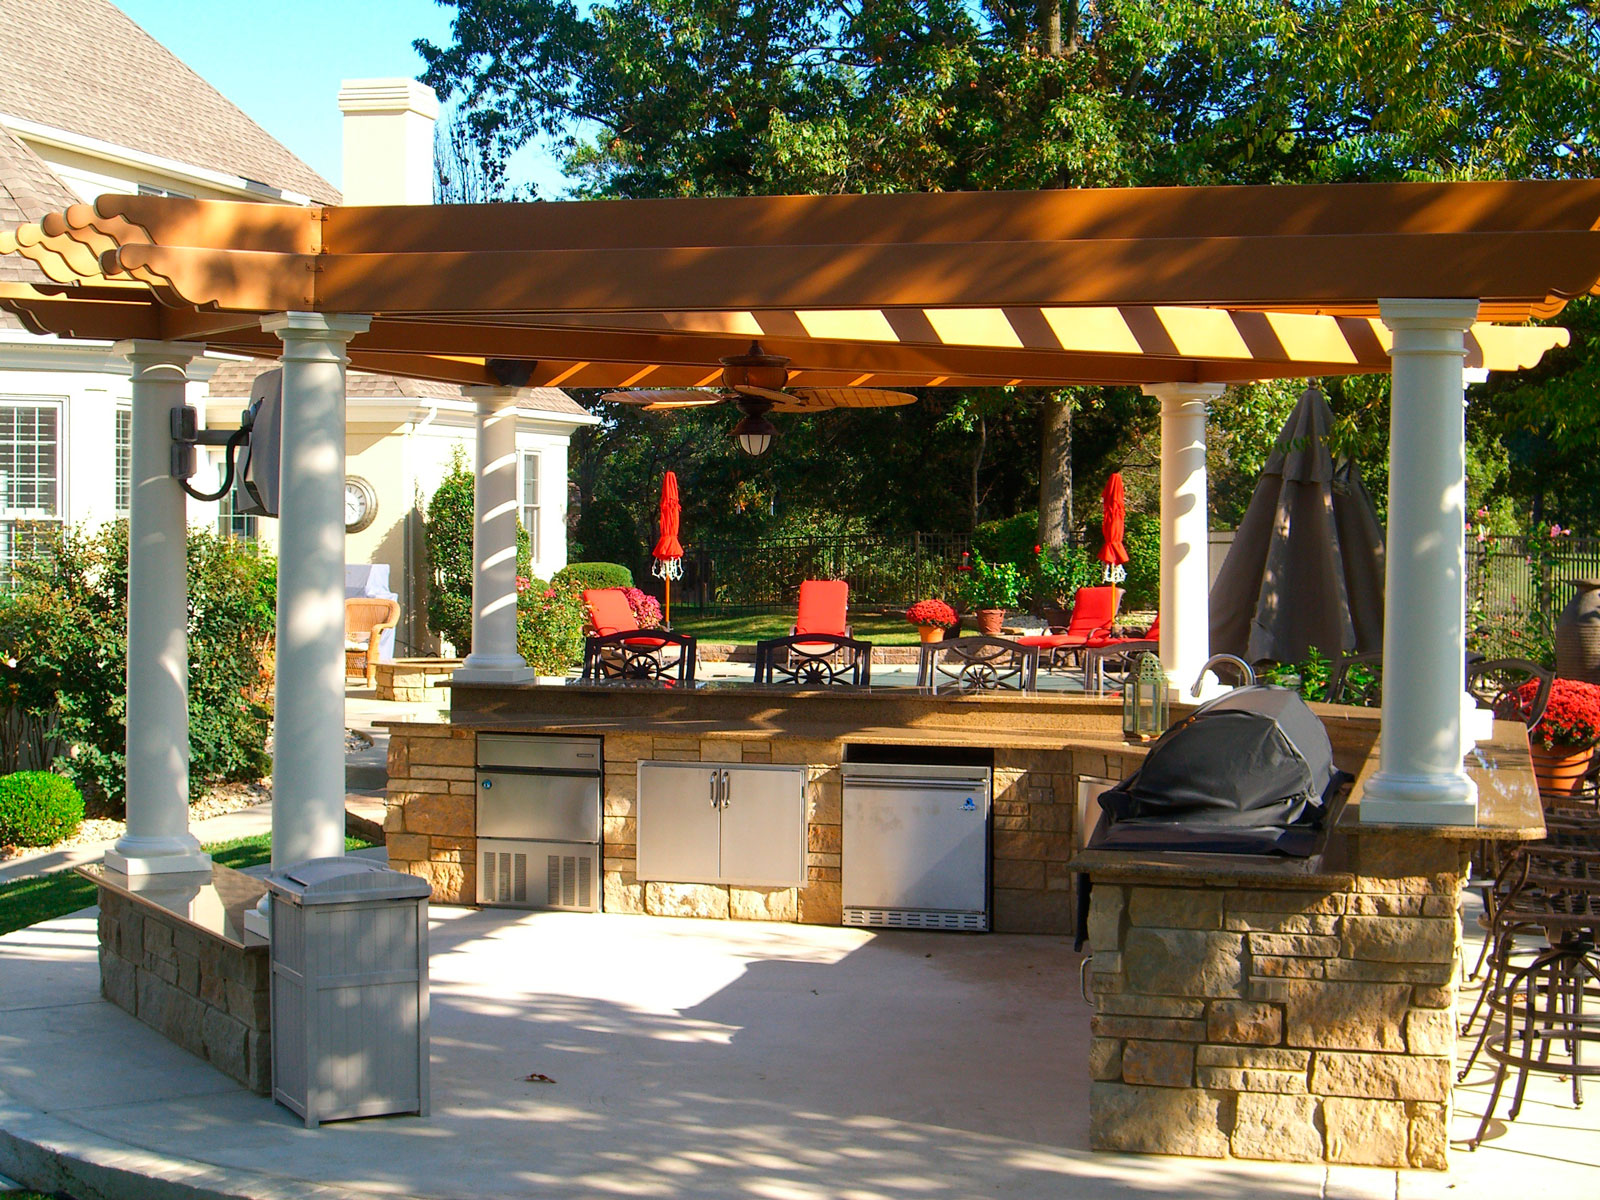 Летняя кухня с барбекю на участке